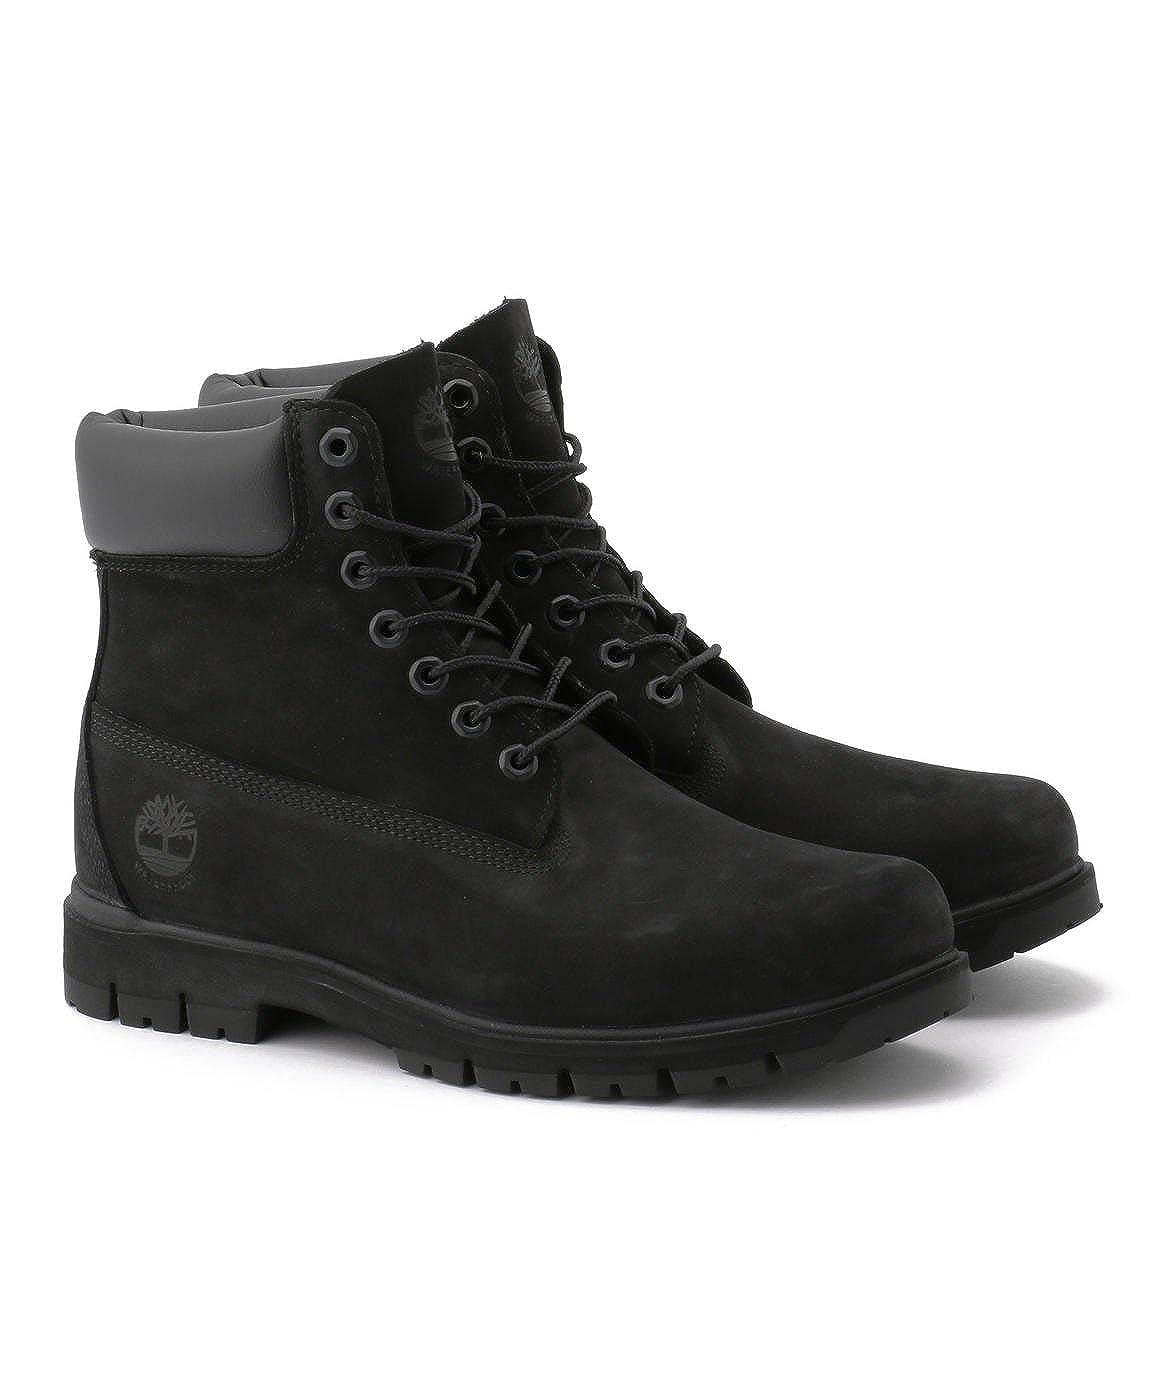 Image of Chukka Timberland Mens Radford 6-Inch Waterproof Nubuck Boots